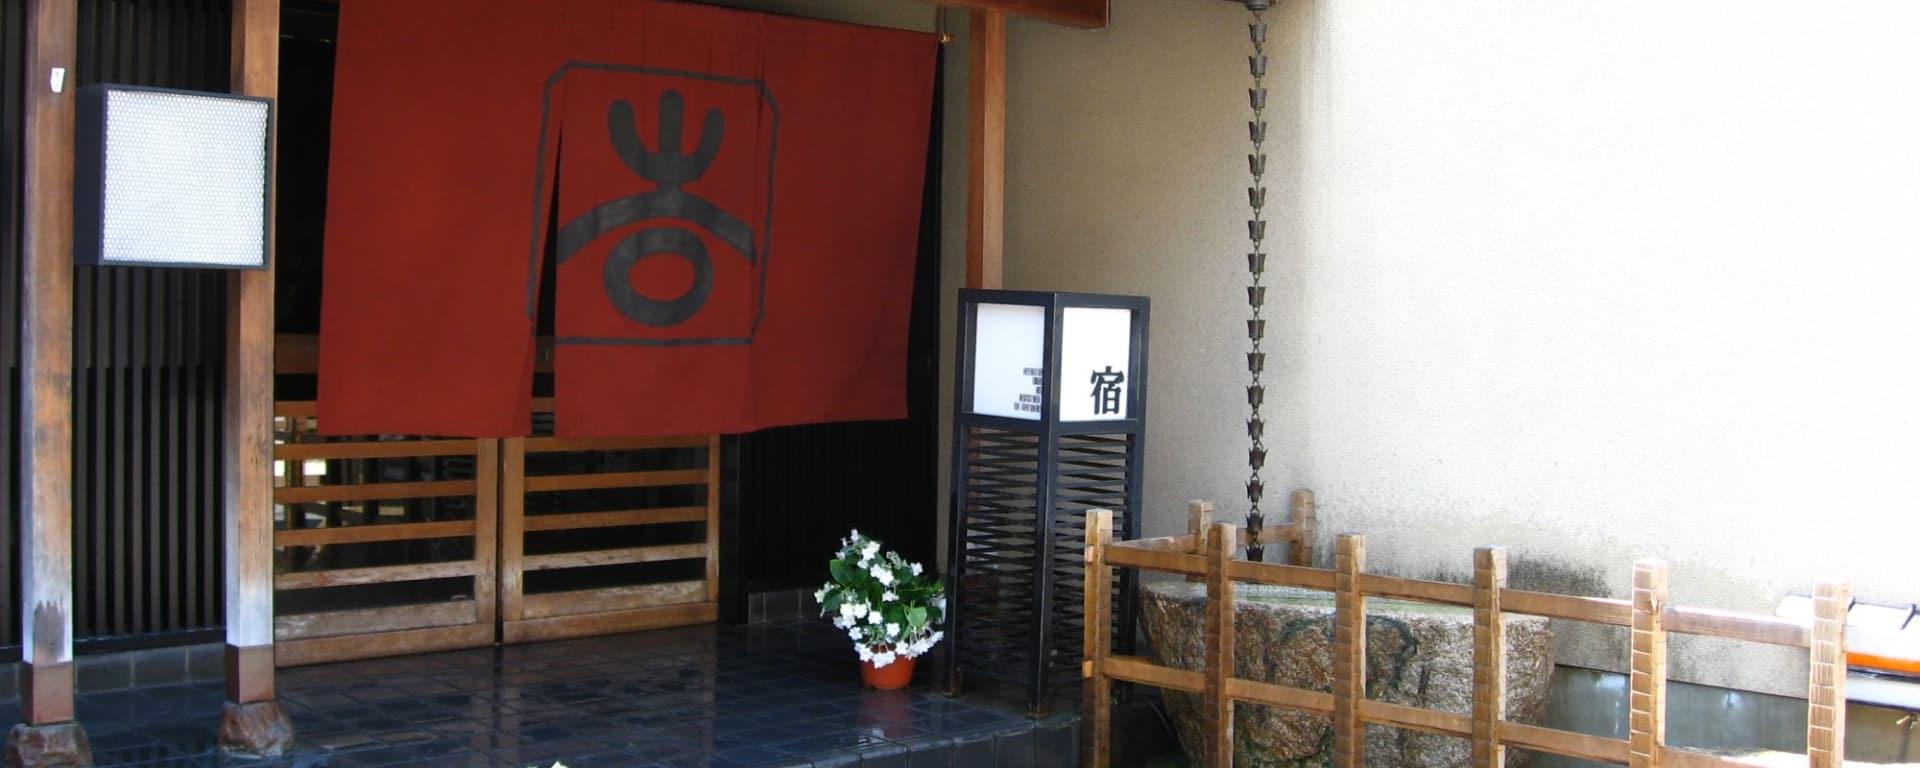 Gion Yoshi-ima Ryokan à Kyoto: Entrance